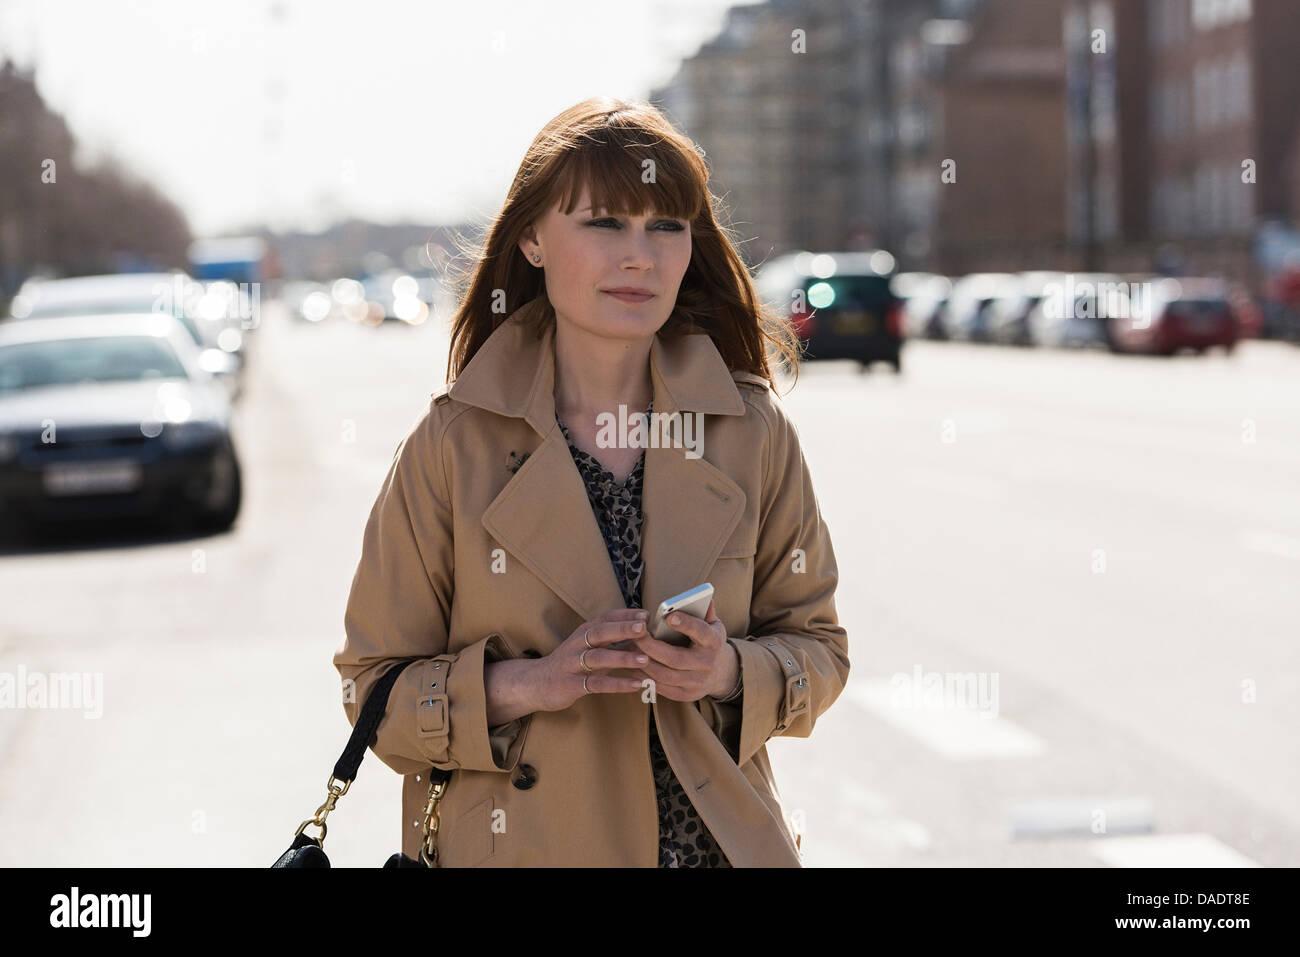 Mujer con teléfono móvil andando calle abajo Imagen De Stock